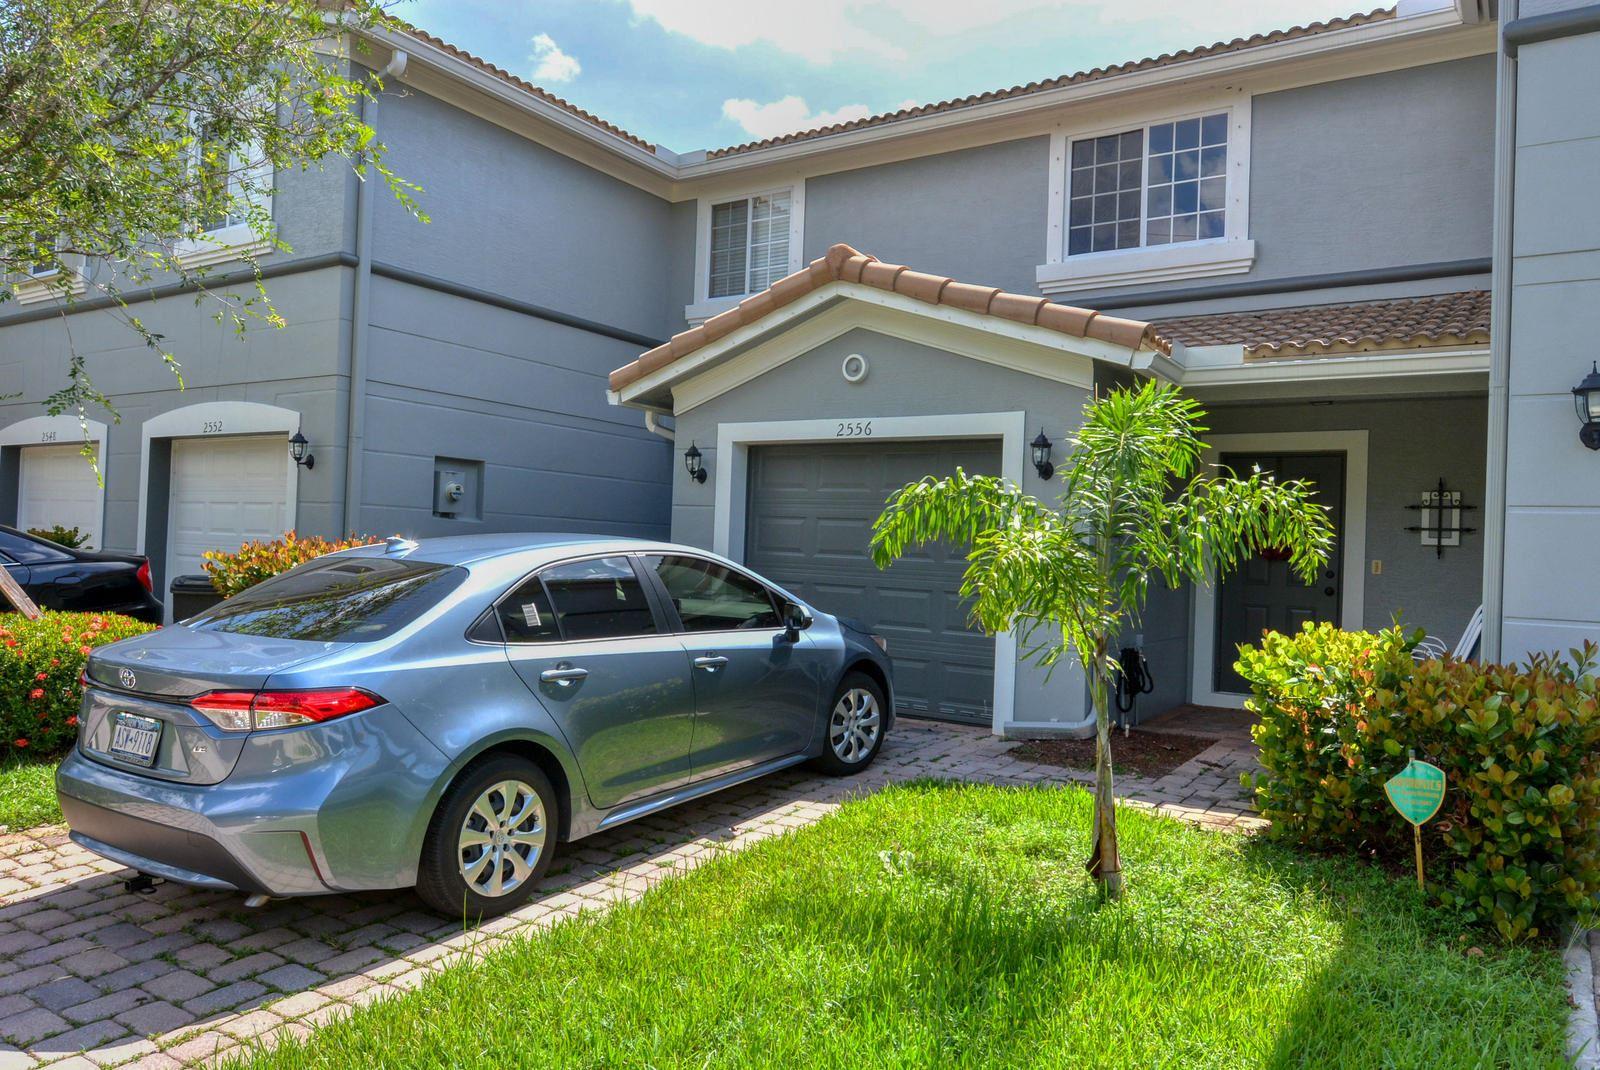 2556 SW Marshfield Court, Port Saint Lucie, FL 34953 - #: RX-10634245